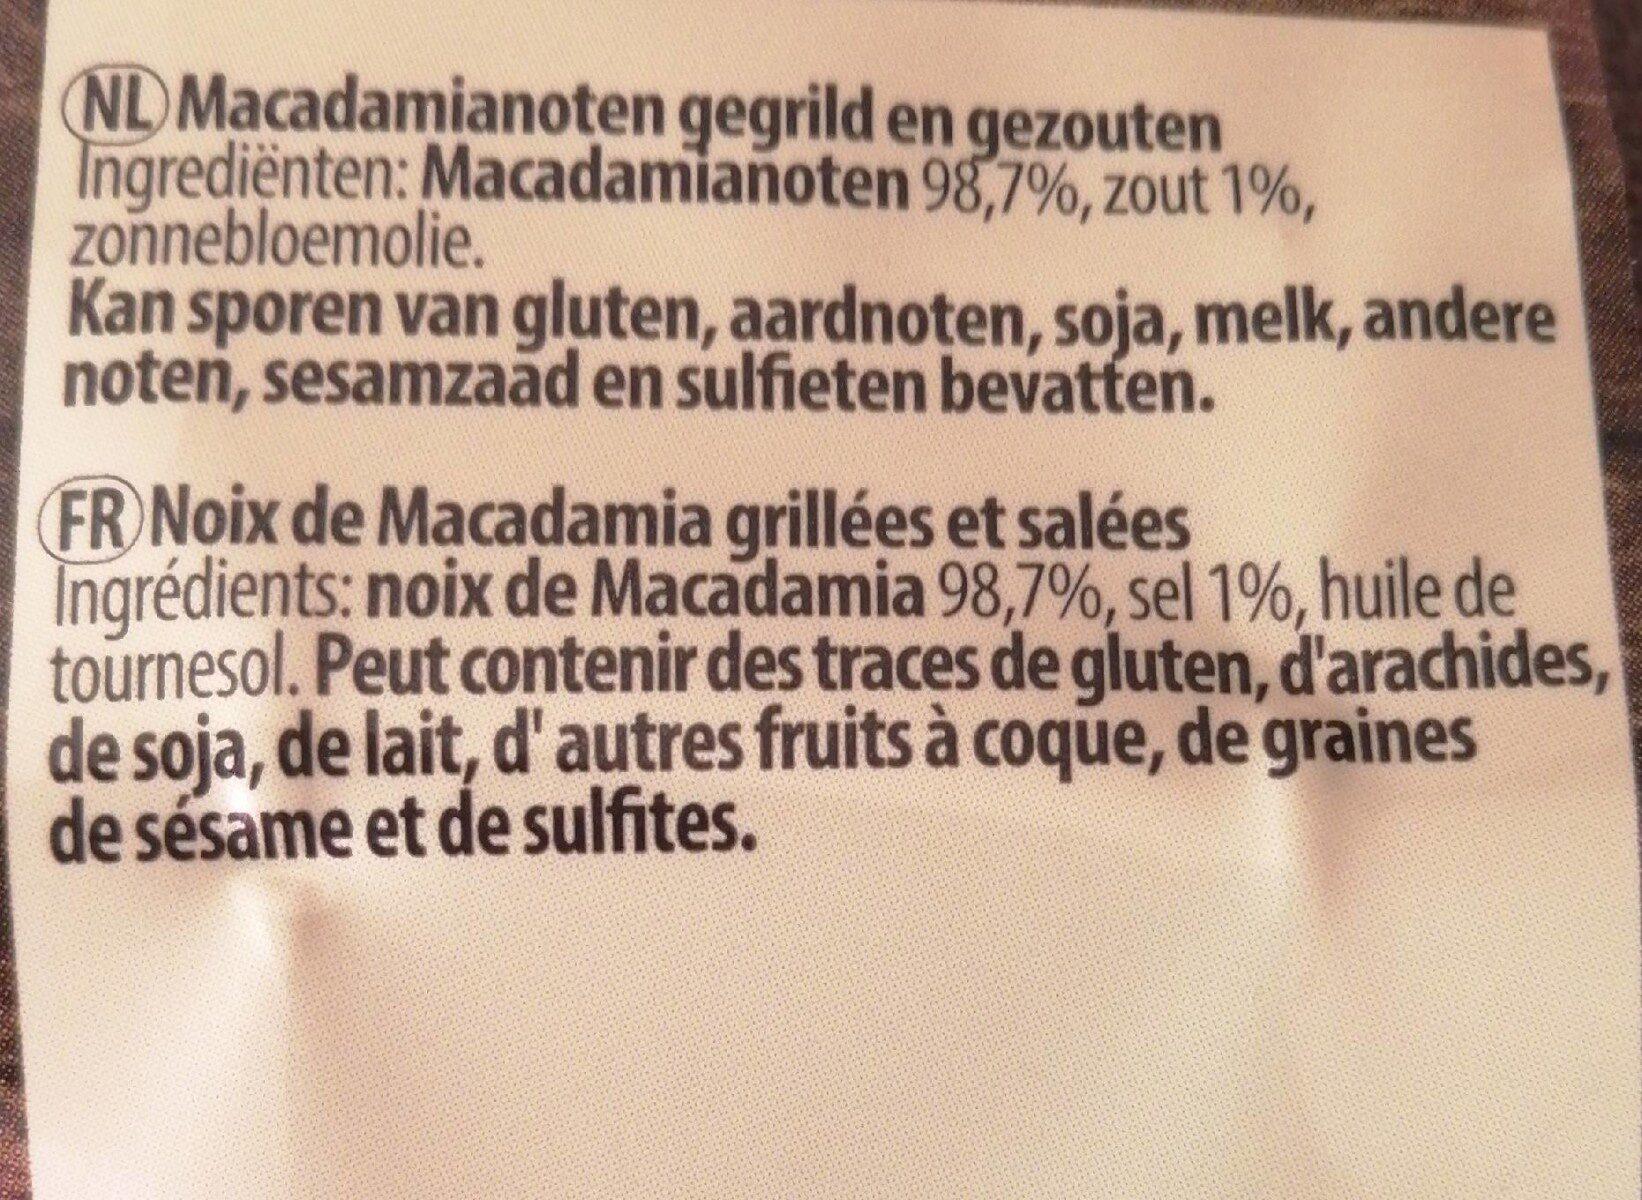 Noix de pécan - Ingrediënten - fr